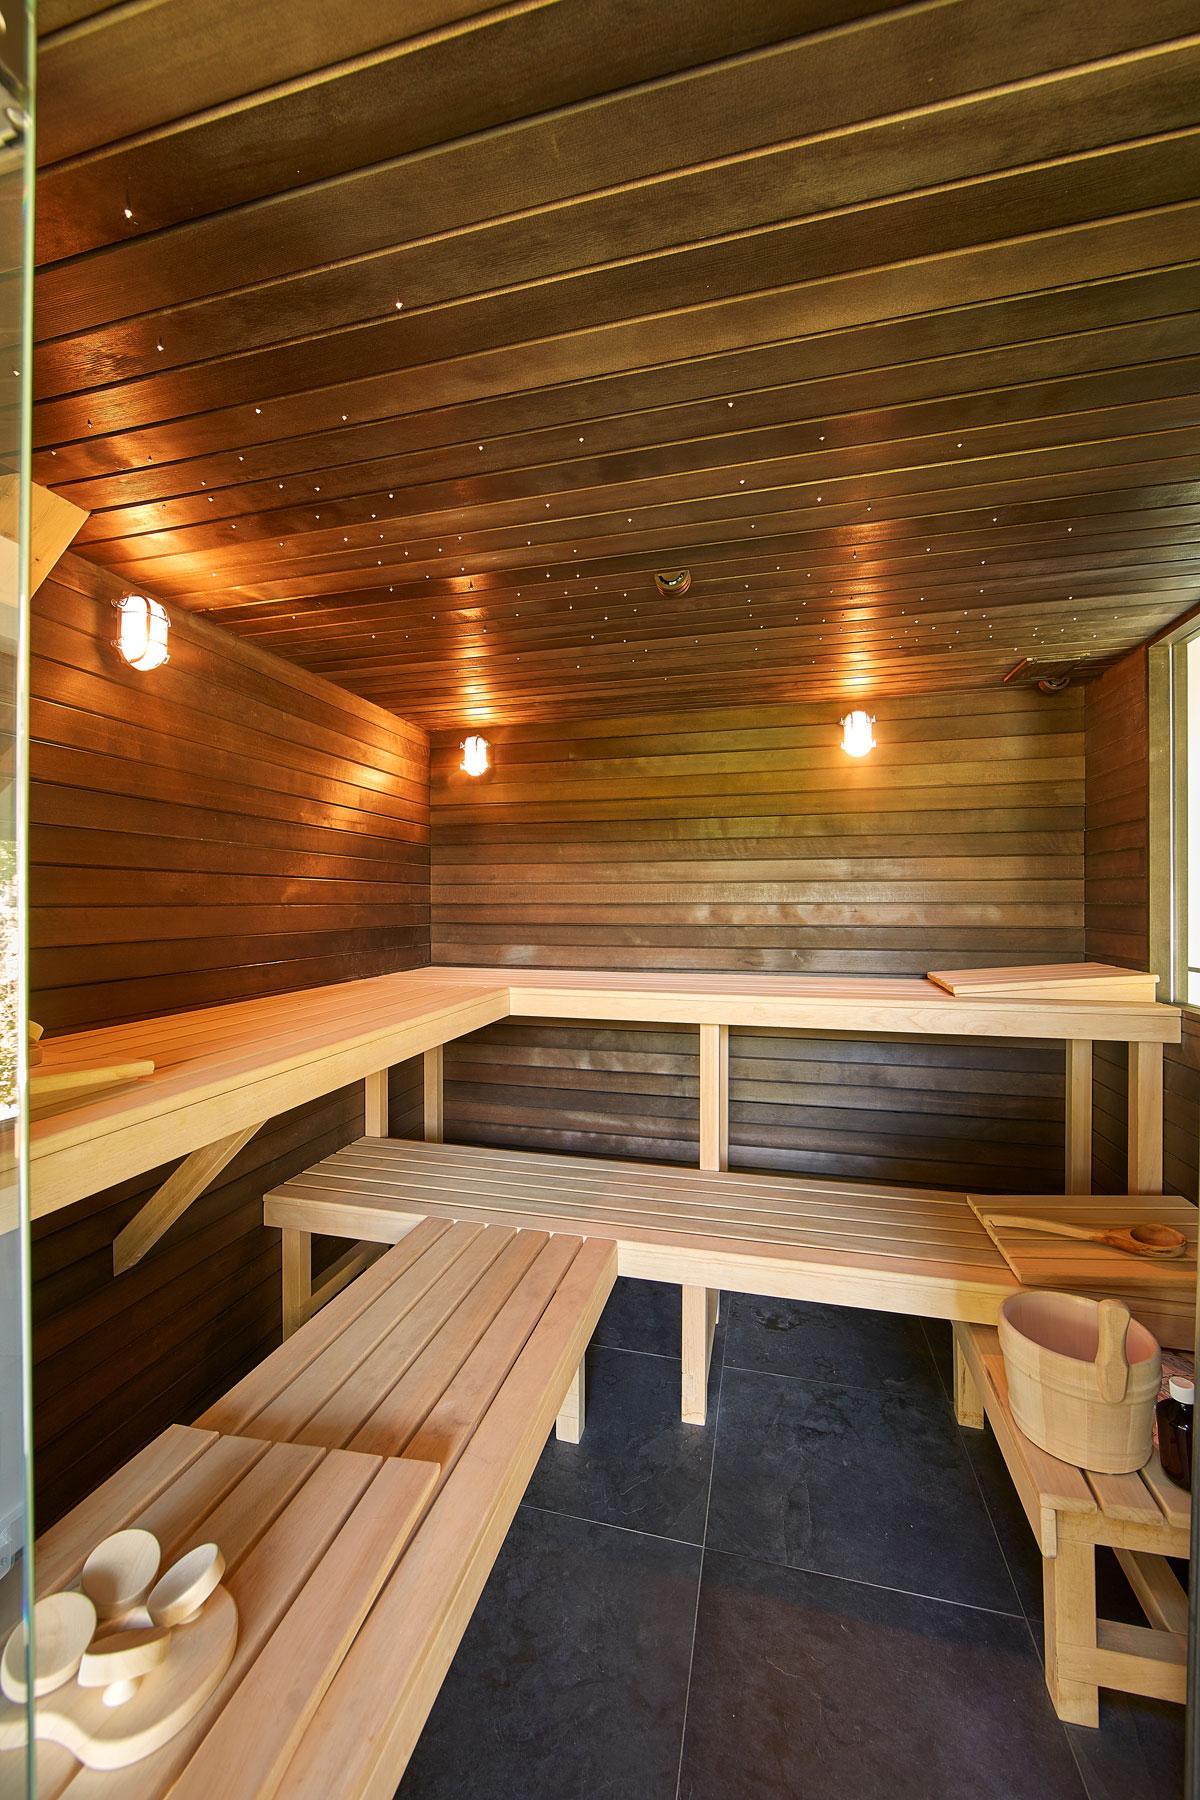 Wellness, Sauna, ontspannen, relaxruimte, symmetrische villa, PBV Architects